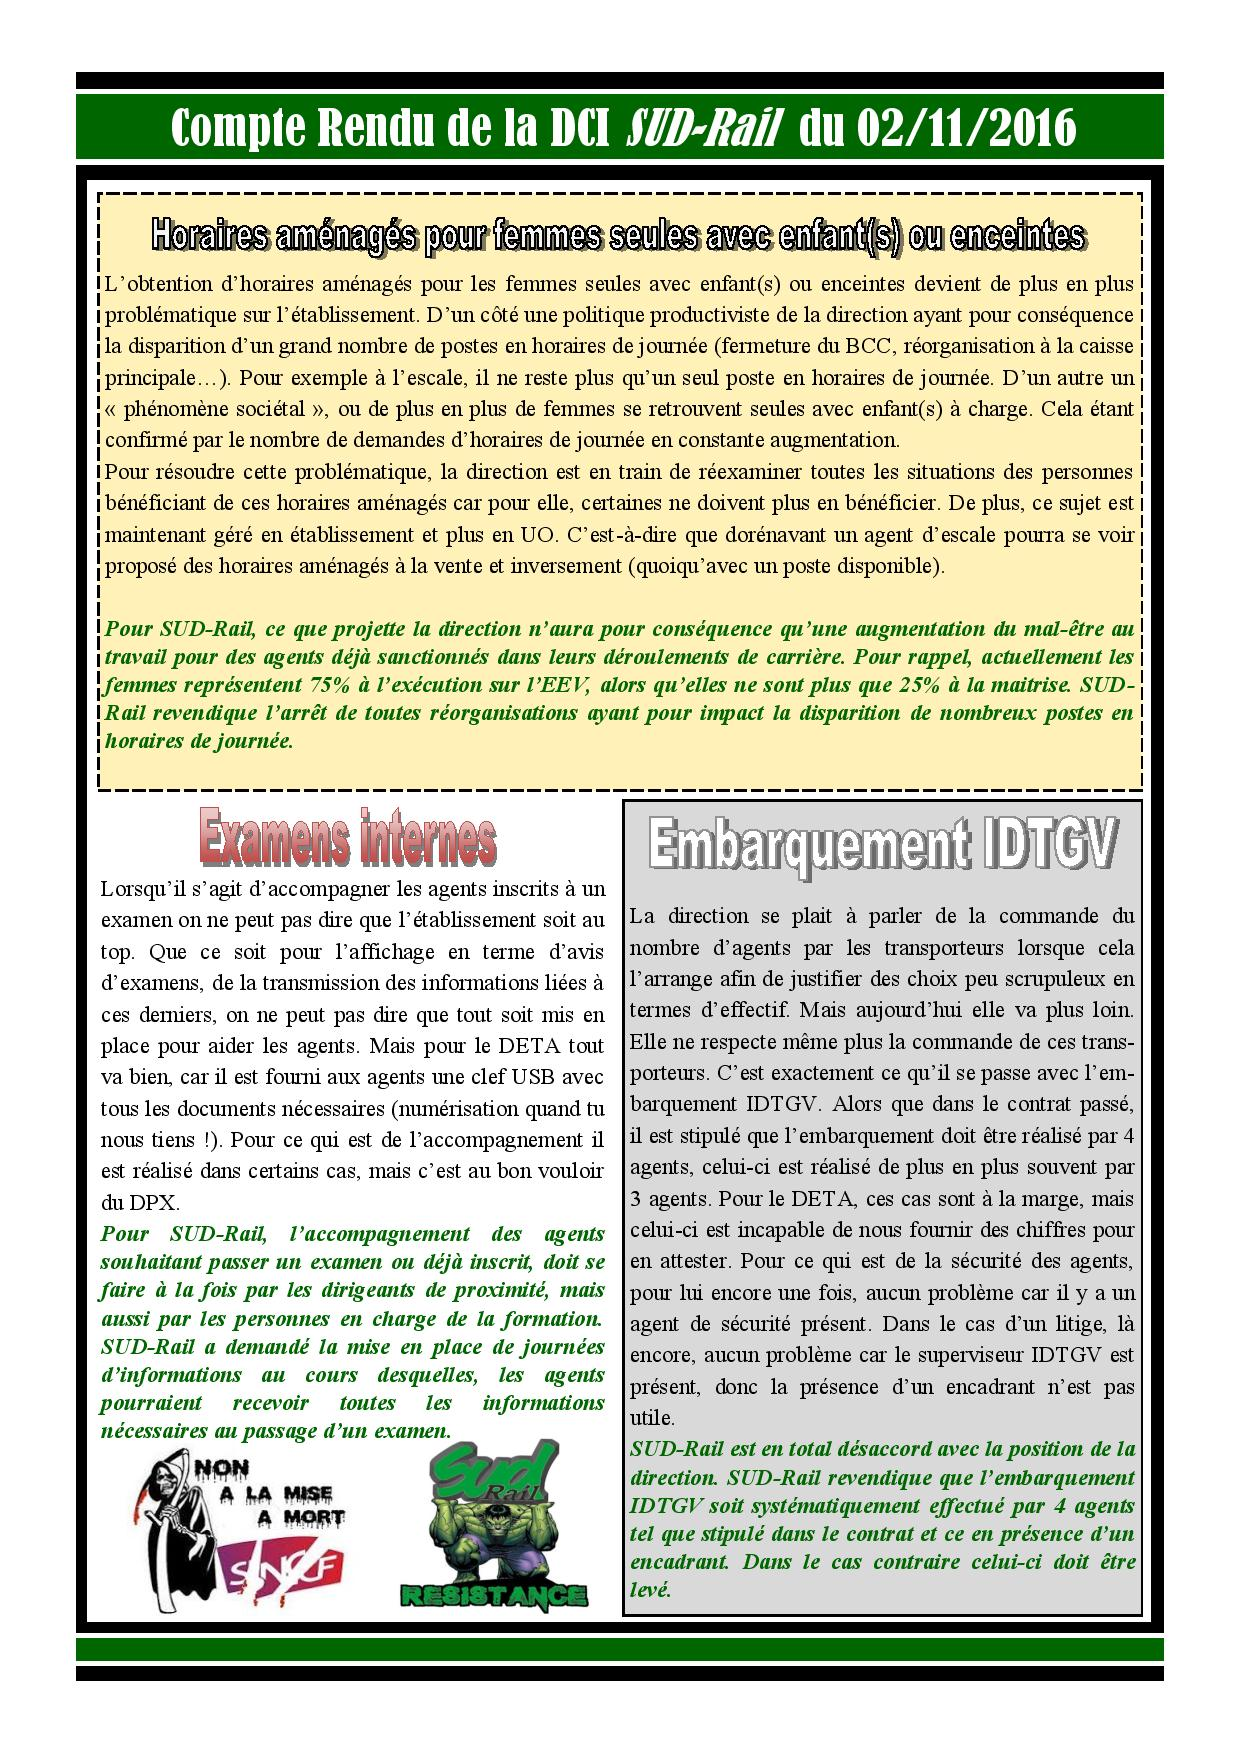 eev-cr-dci-02-11-2016-page-003